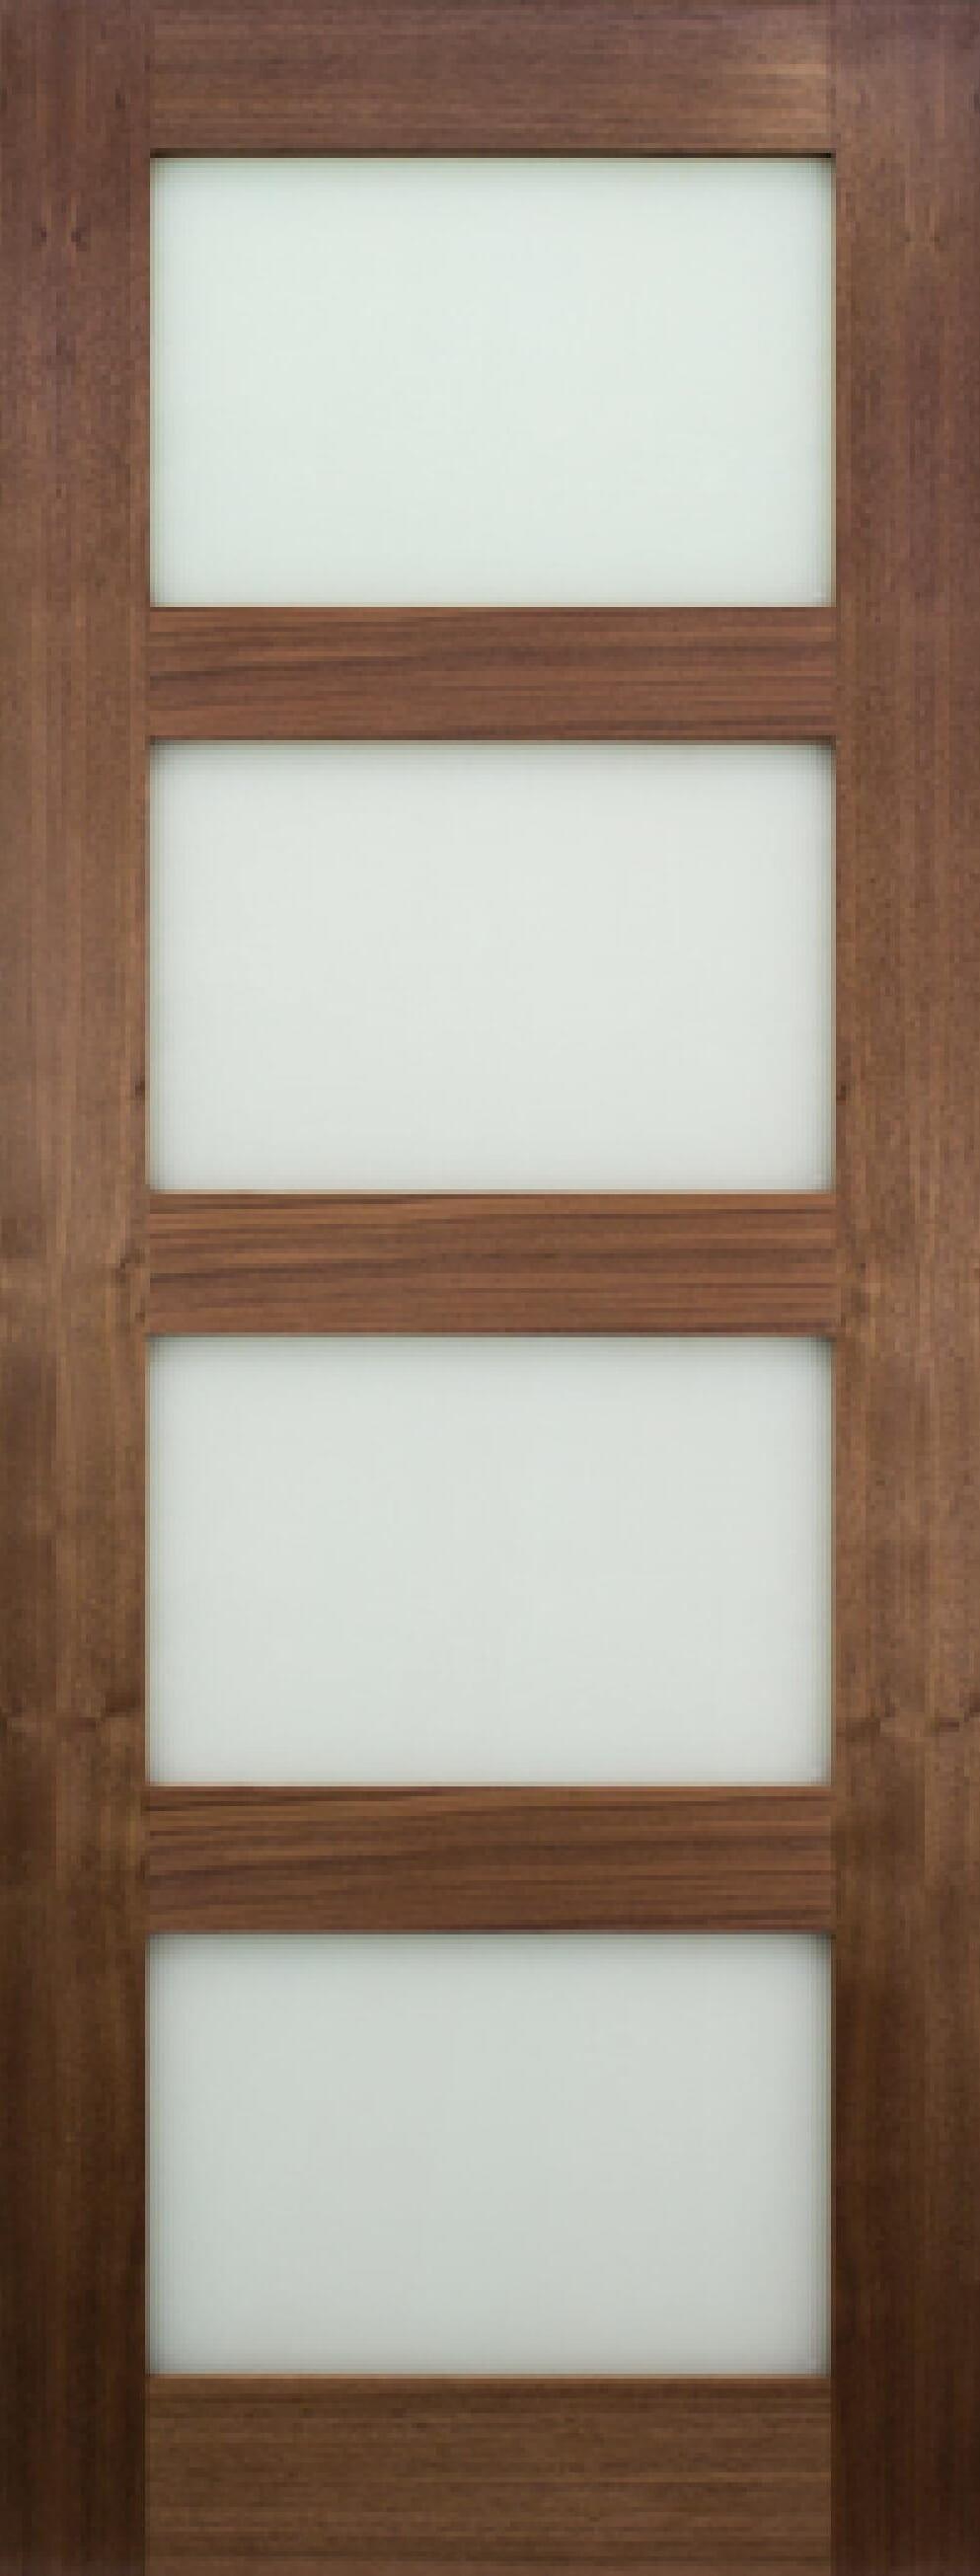 Coventry Walnut Glazed - Frosted Prefinished Image